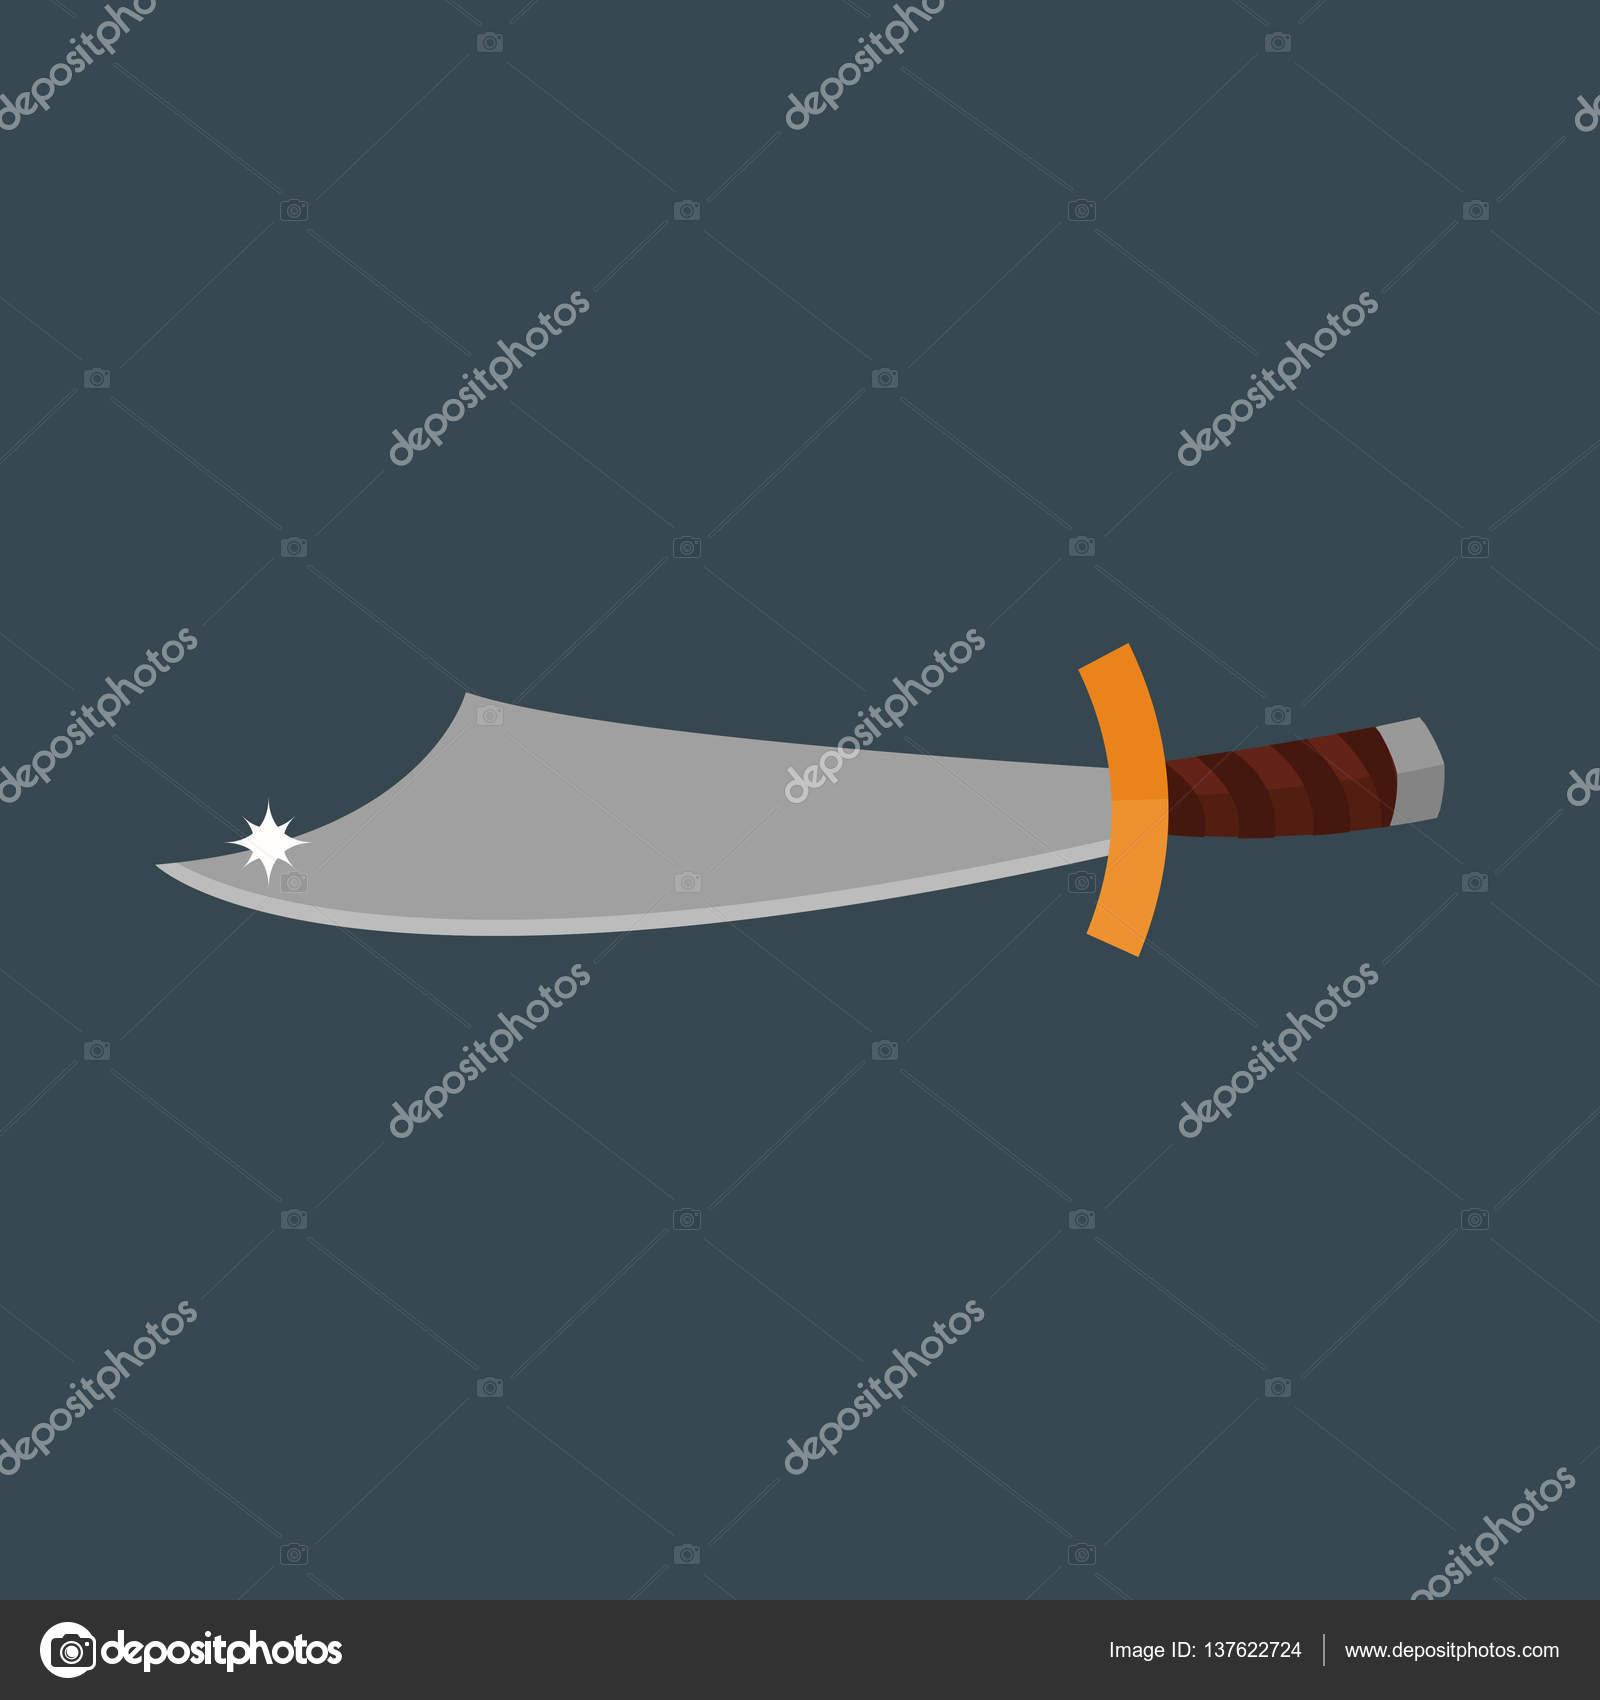 Messer Waffe Vektor Illustration Stockvektor C Adekvat 137622724